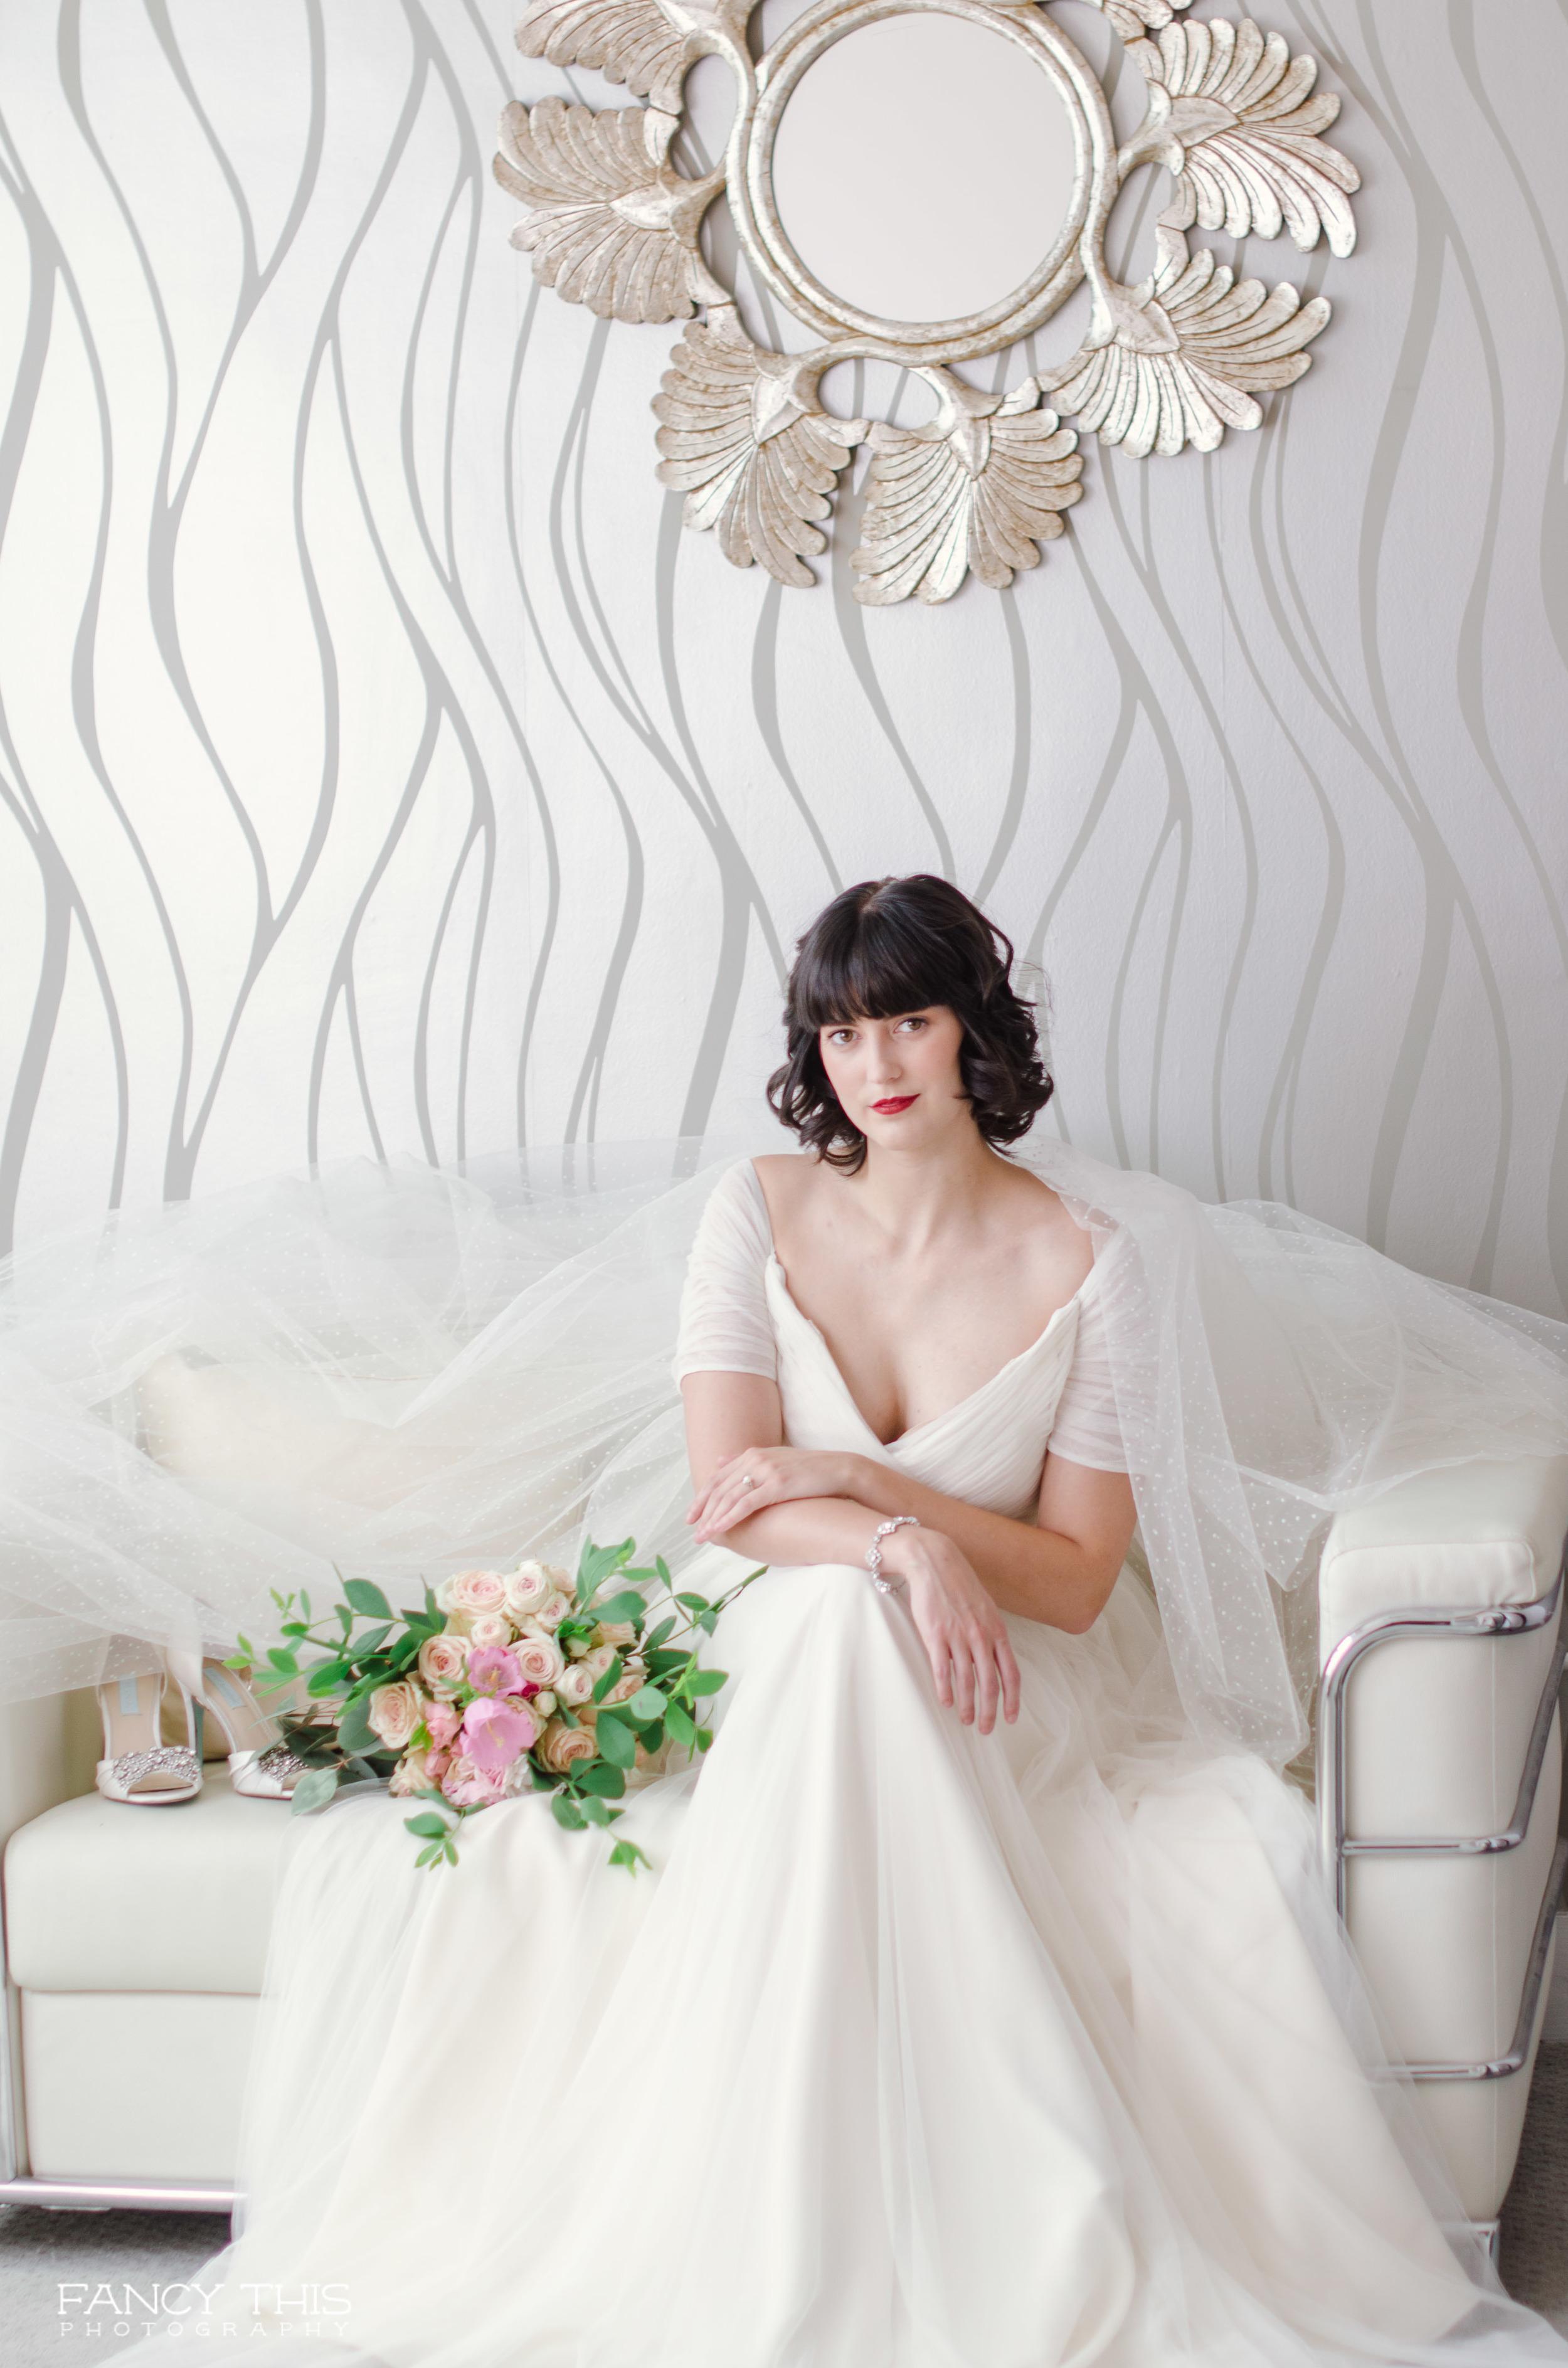 joy_bridal-25.jpg